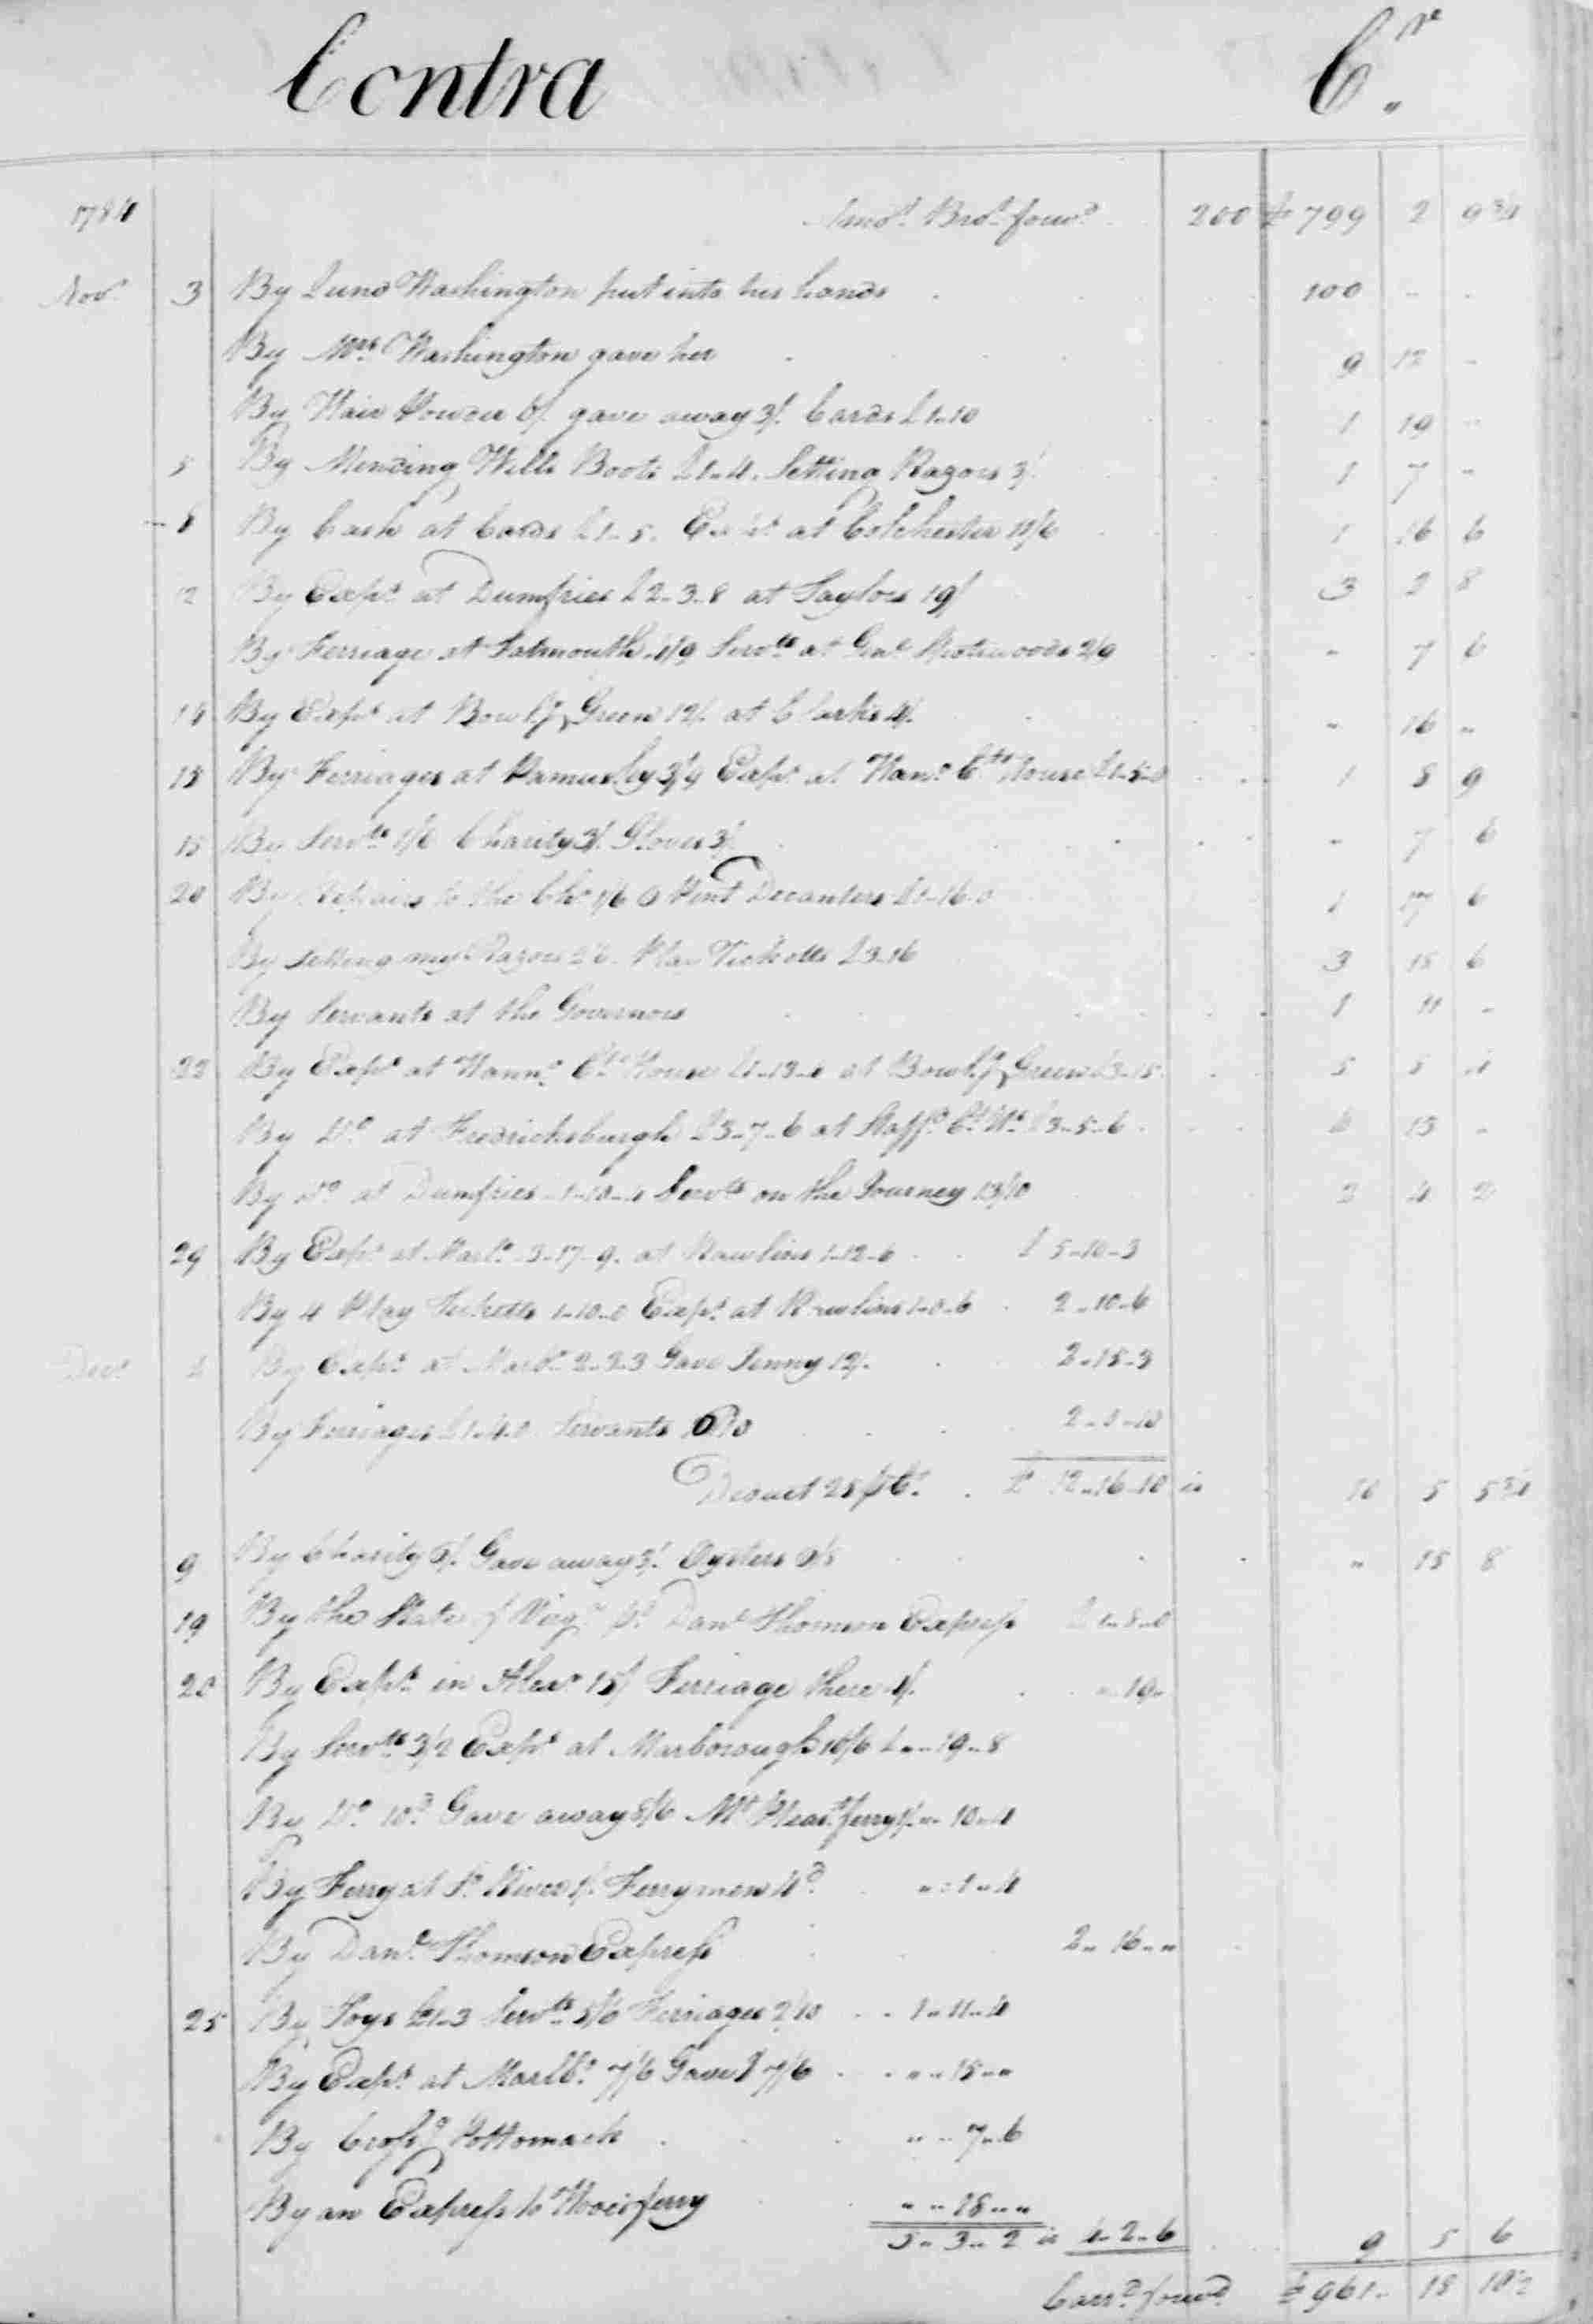 Ledger B, folio 201, right side